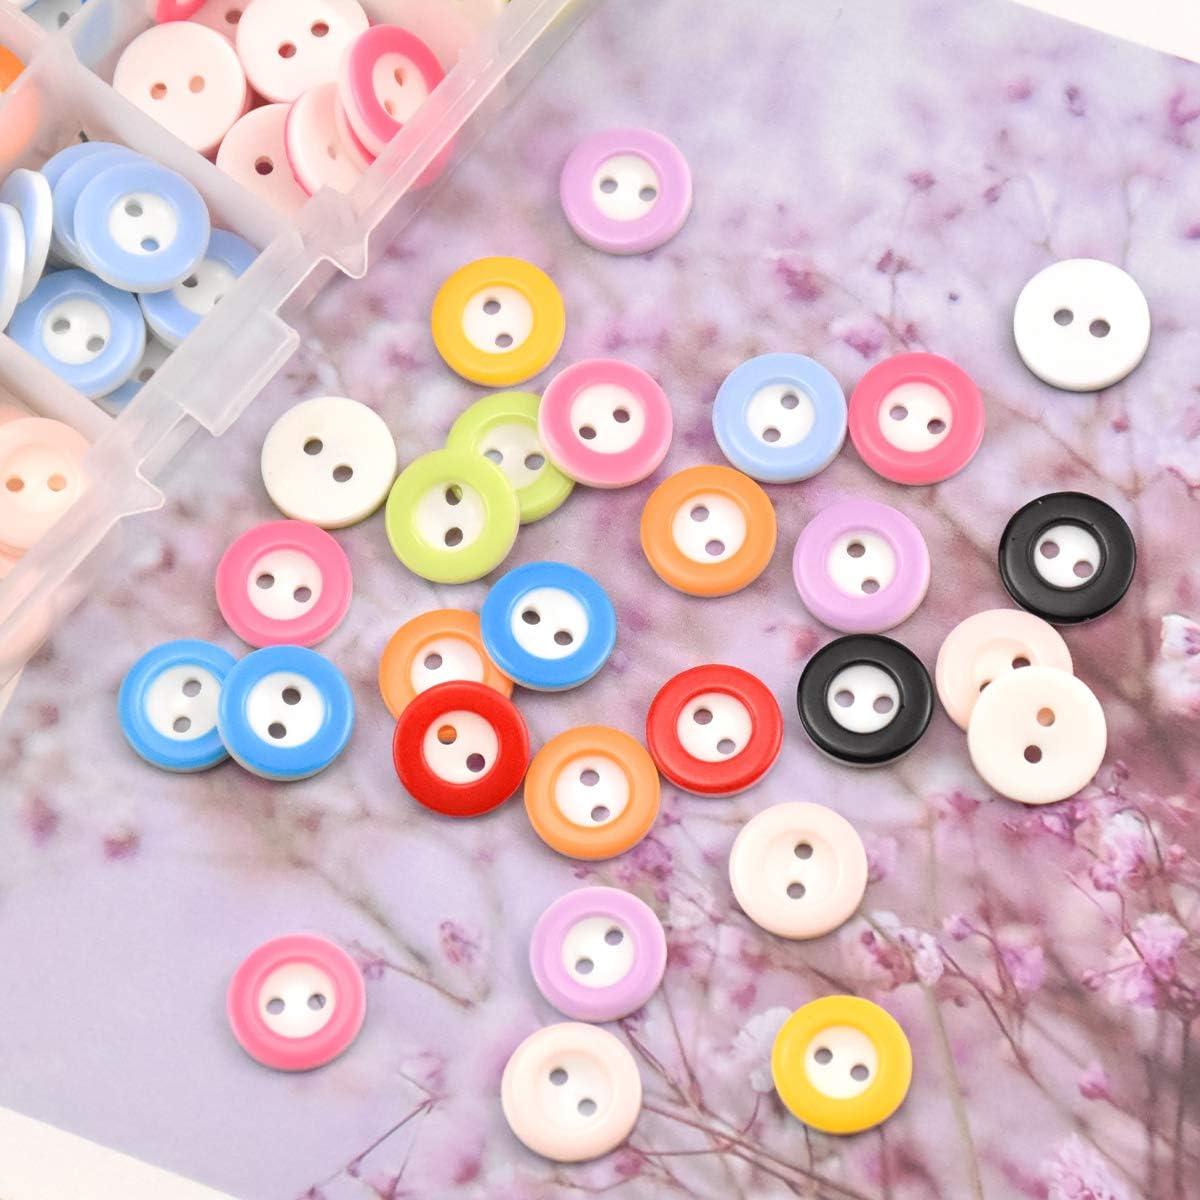 10 Colores 150 Pzs Botones Costura Botones de Ropa de Beb/é Infantil 2 Agujero con Caja de Pl/ástico para Manualidades Coser Artesan/ía Bot/ón de Colores Surtidos Redondos Botones de Resina